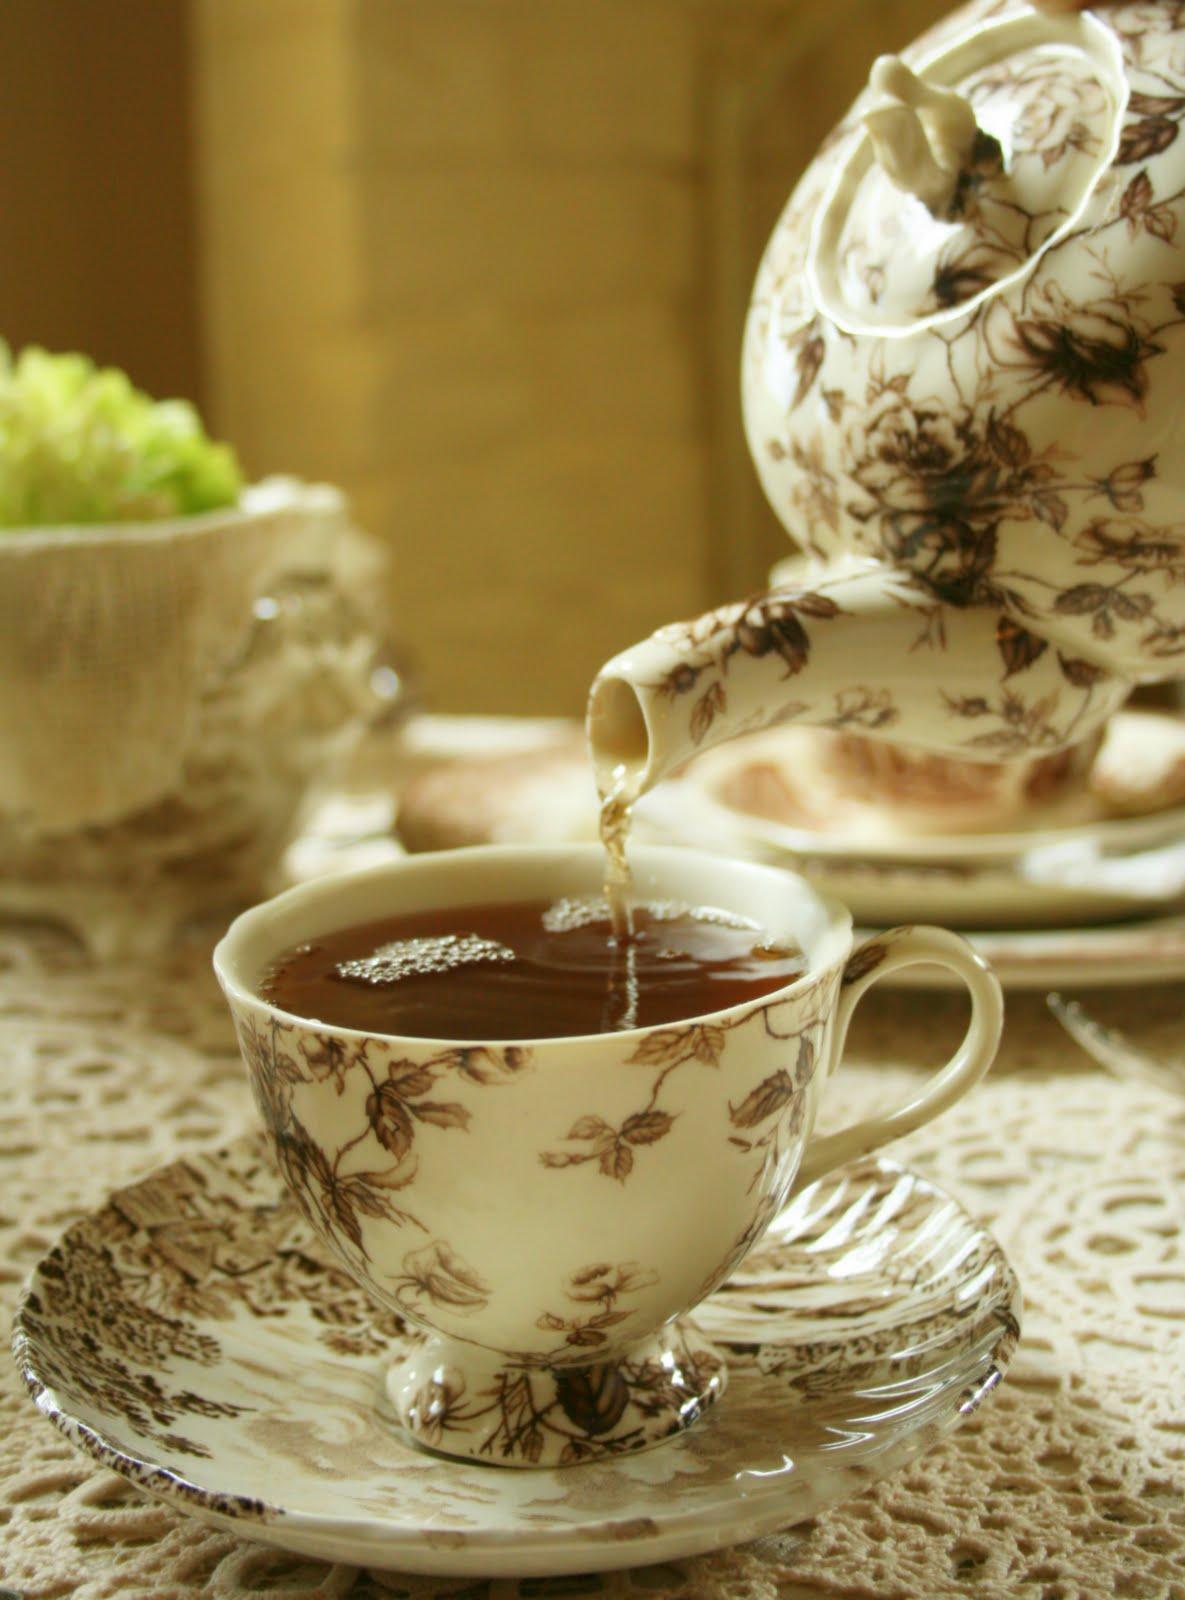 Wuthering Iris: Sunday Morning Breakfast |Sunday Morning Breakfast